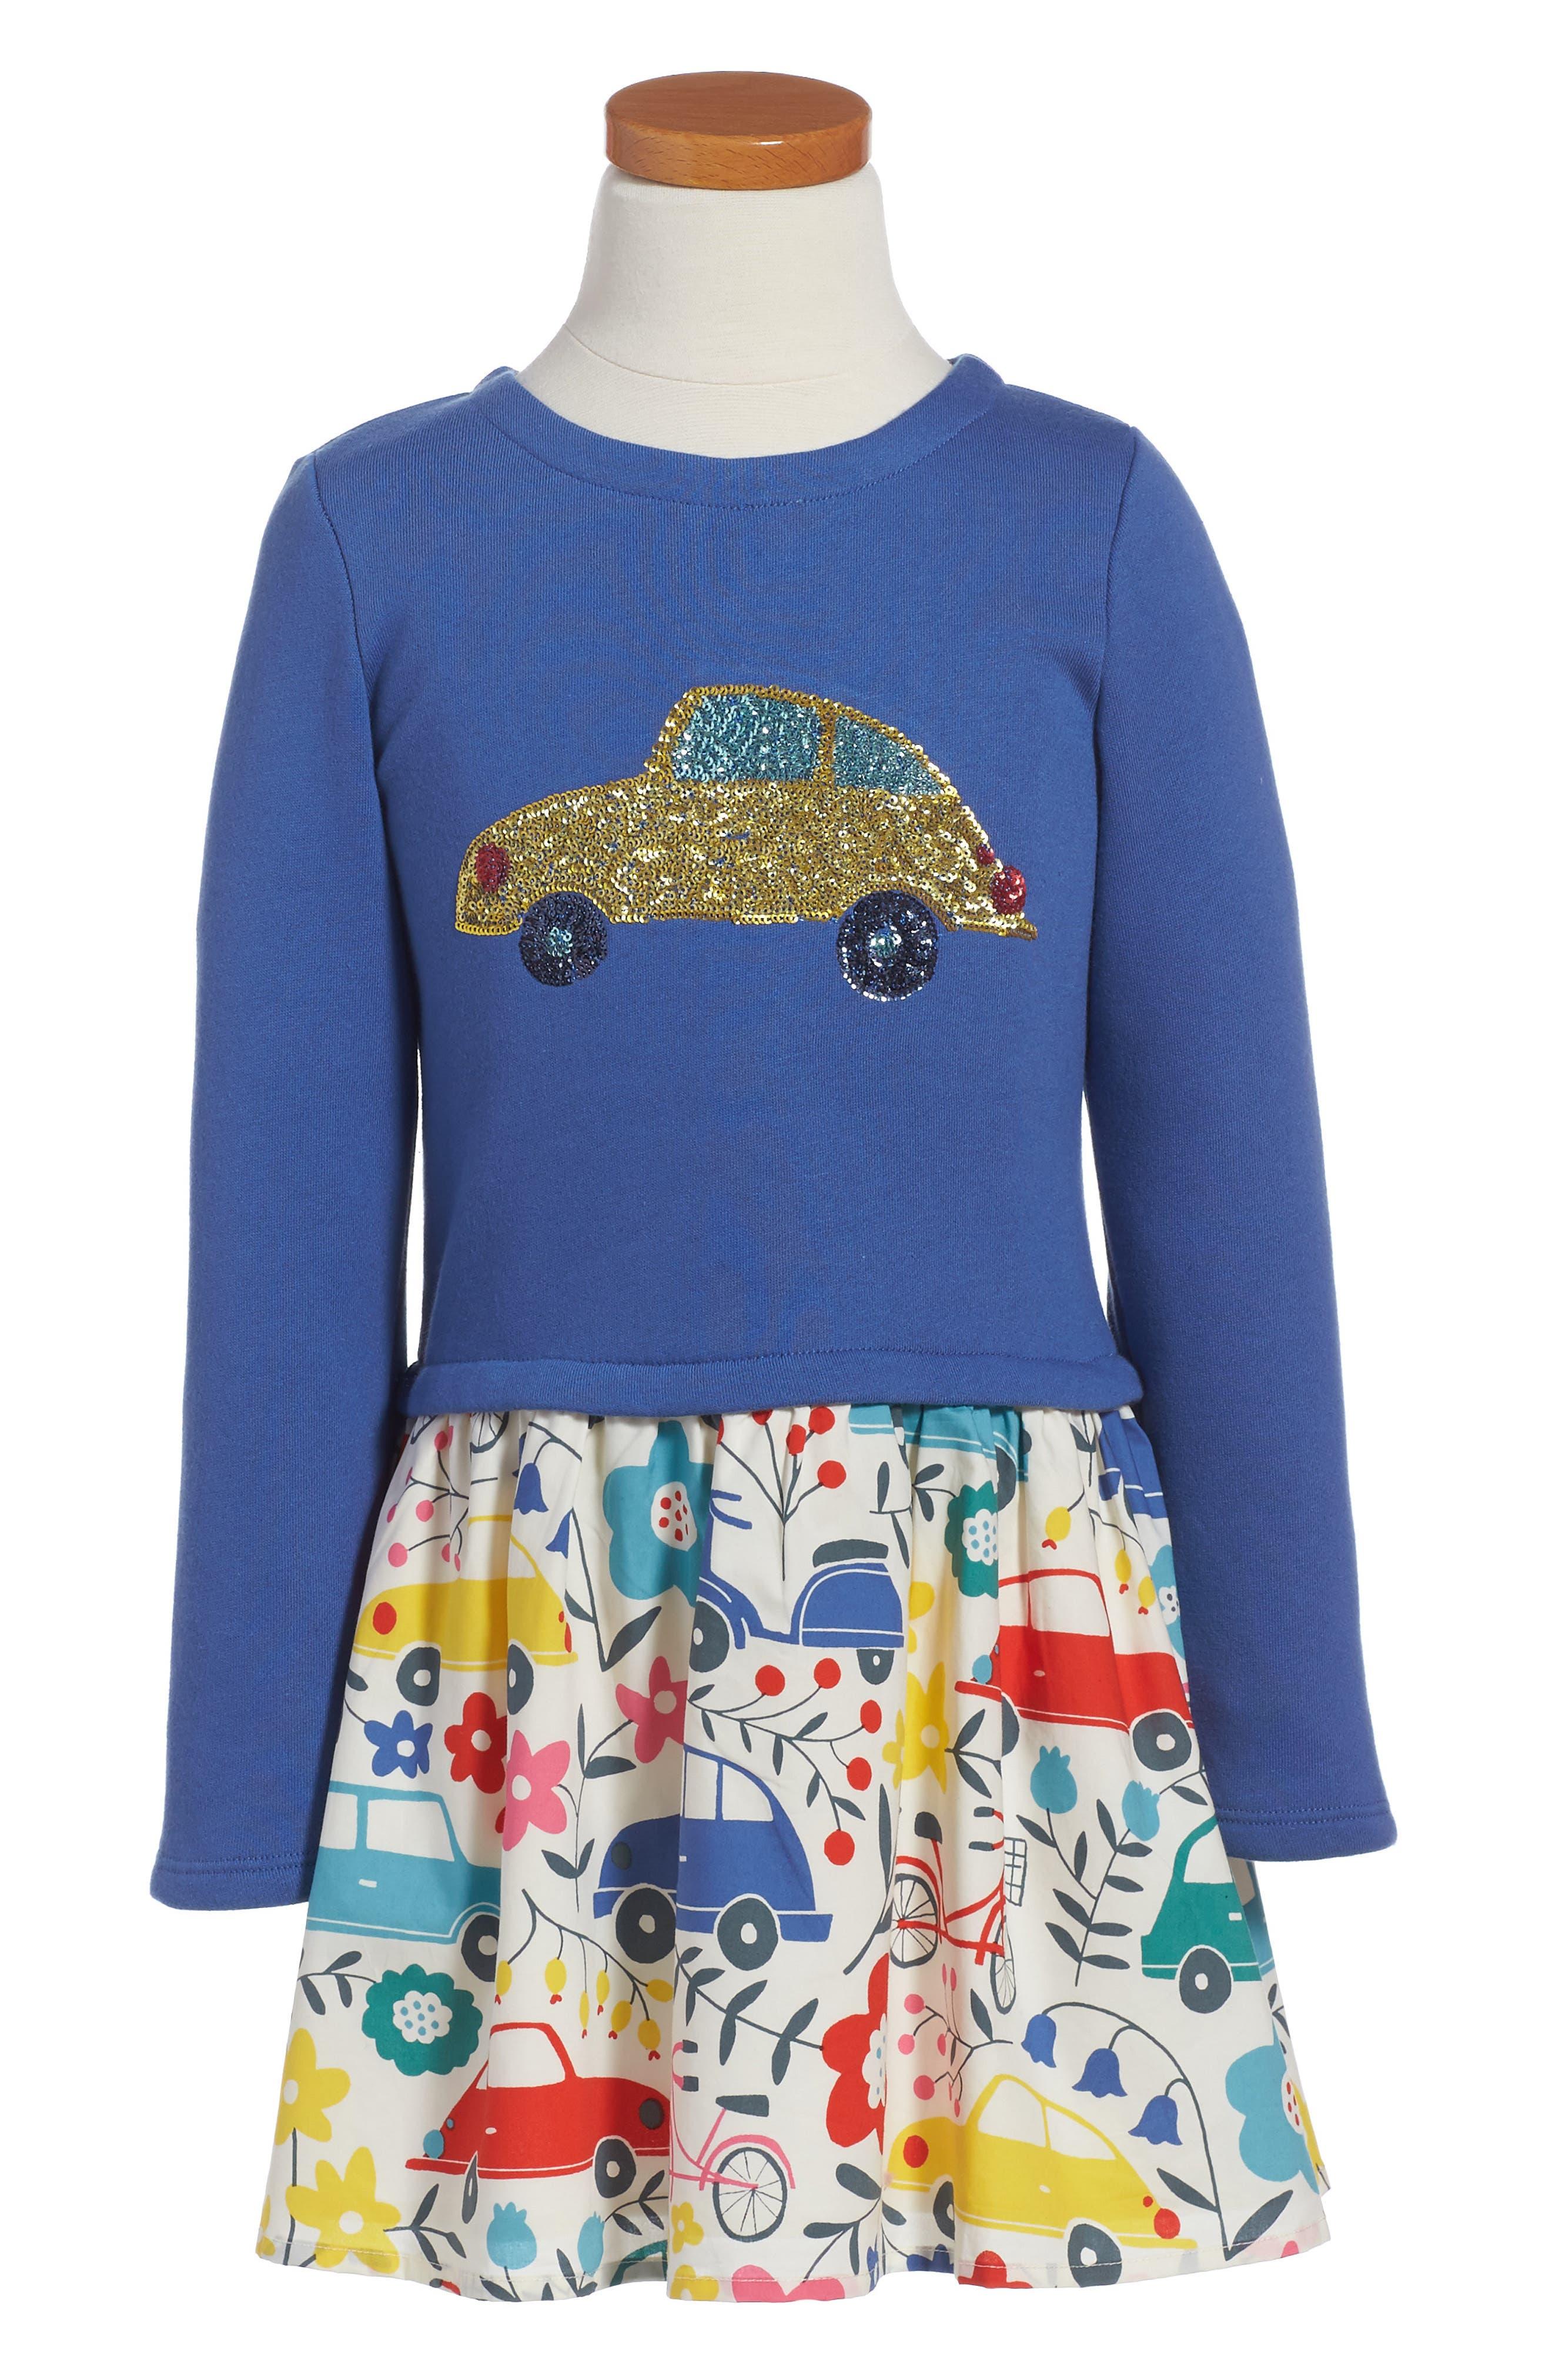 Main Image - Mini Boden Sequin Appliqué Dress (Toddler Girls, Little Girls & Big Girls)